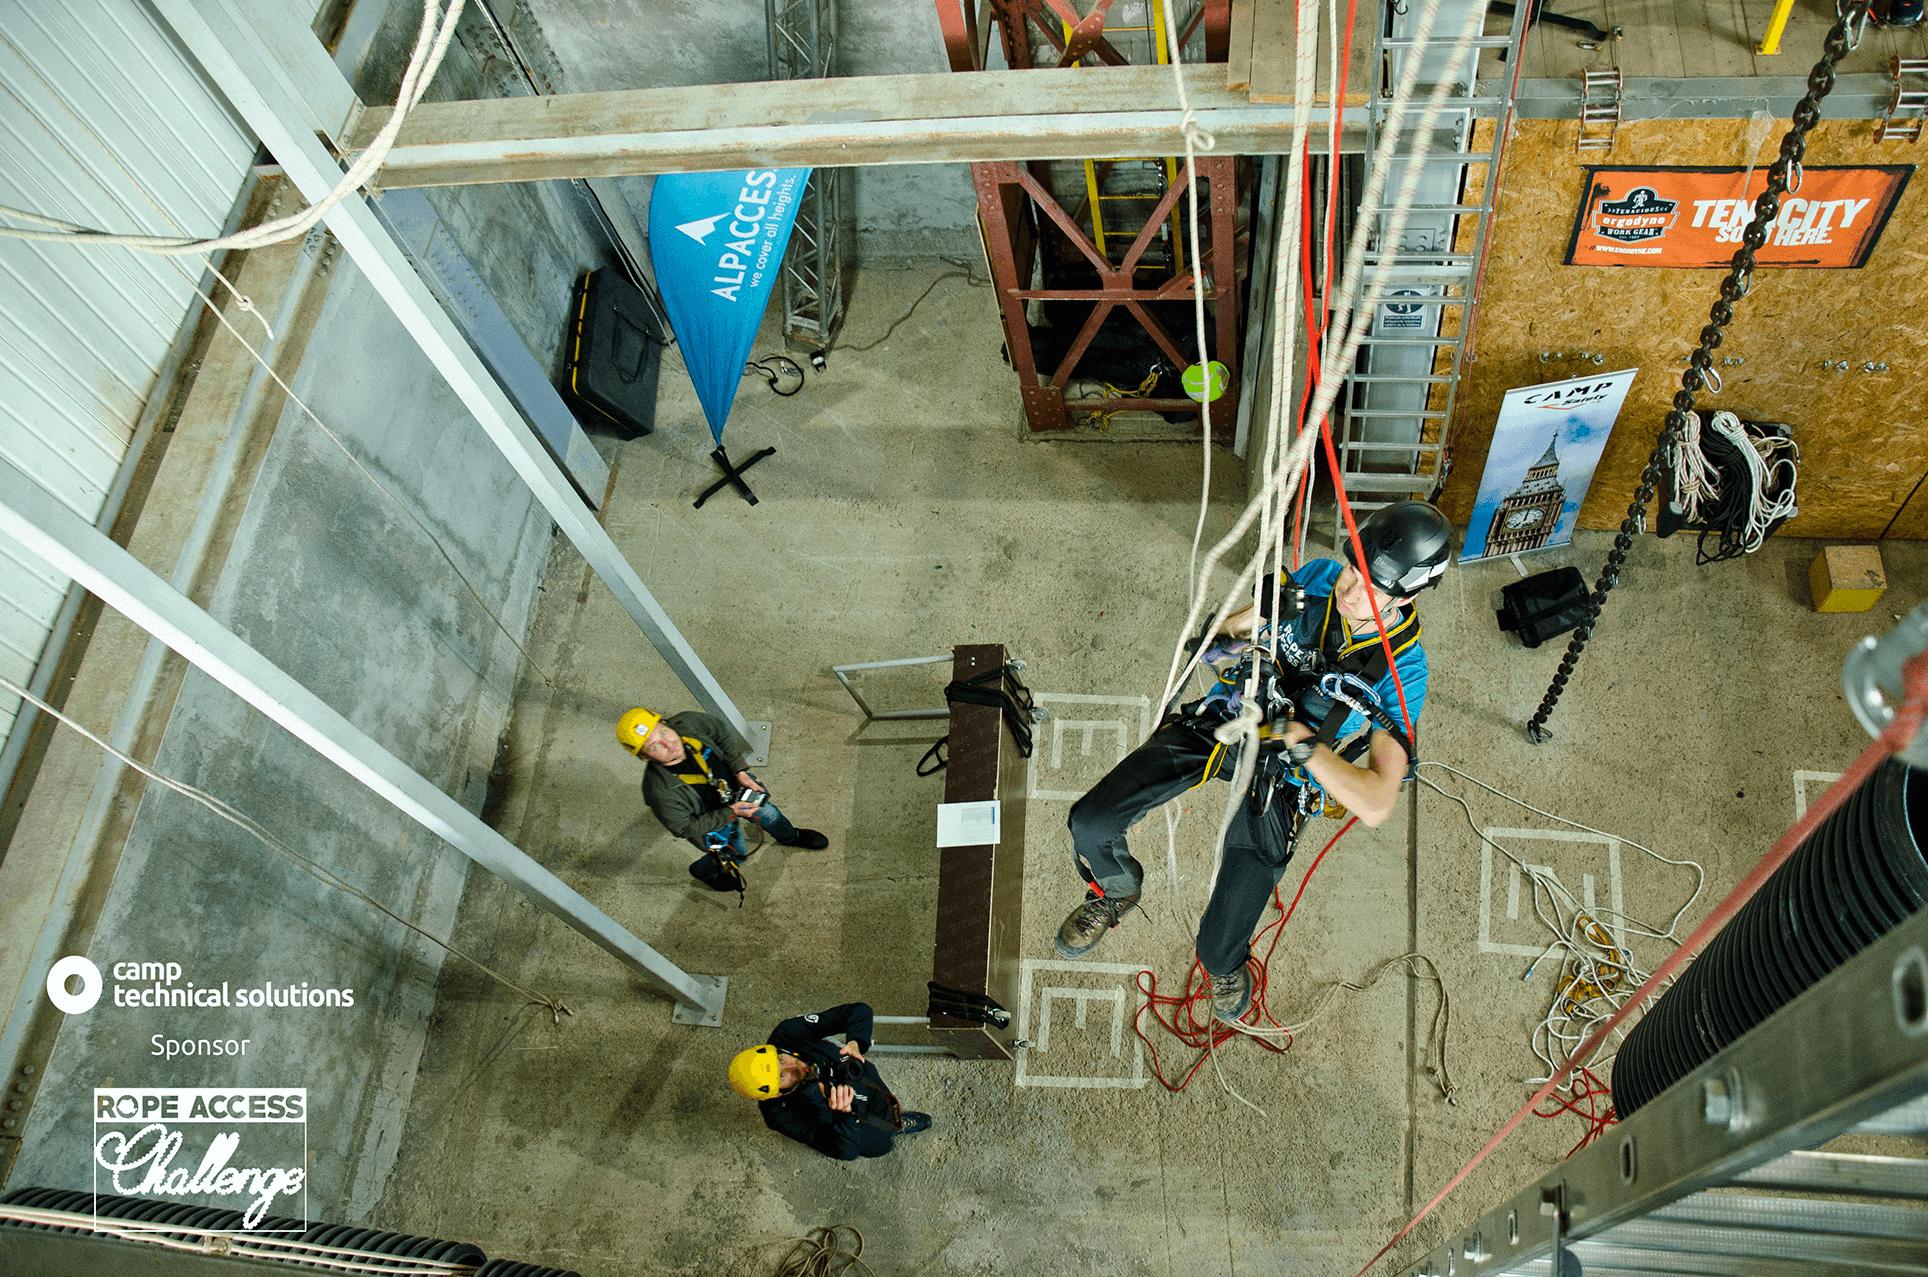 cum-decurs-rope-access-challenge-2019-11